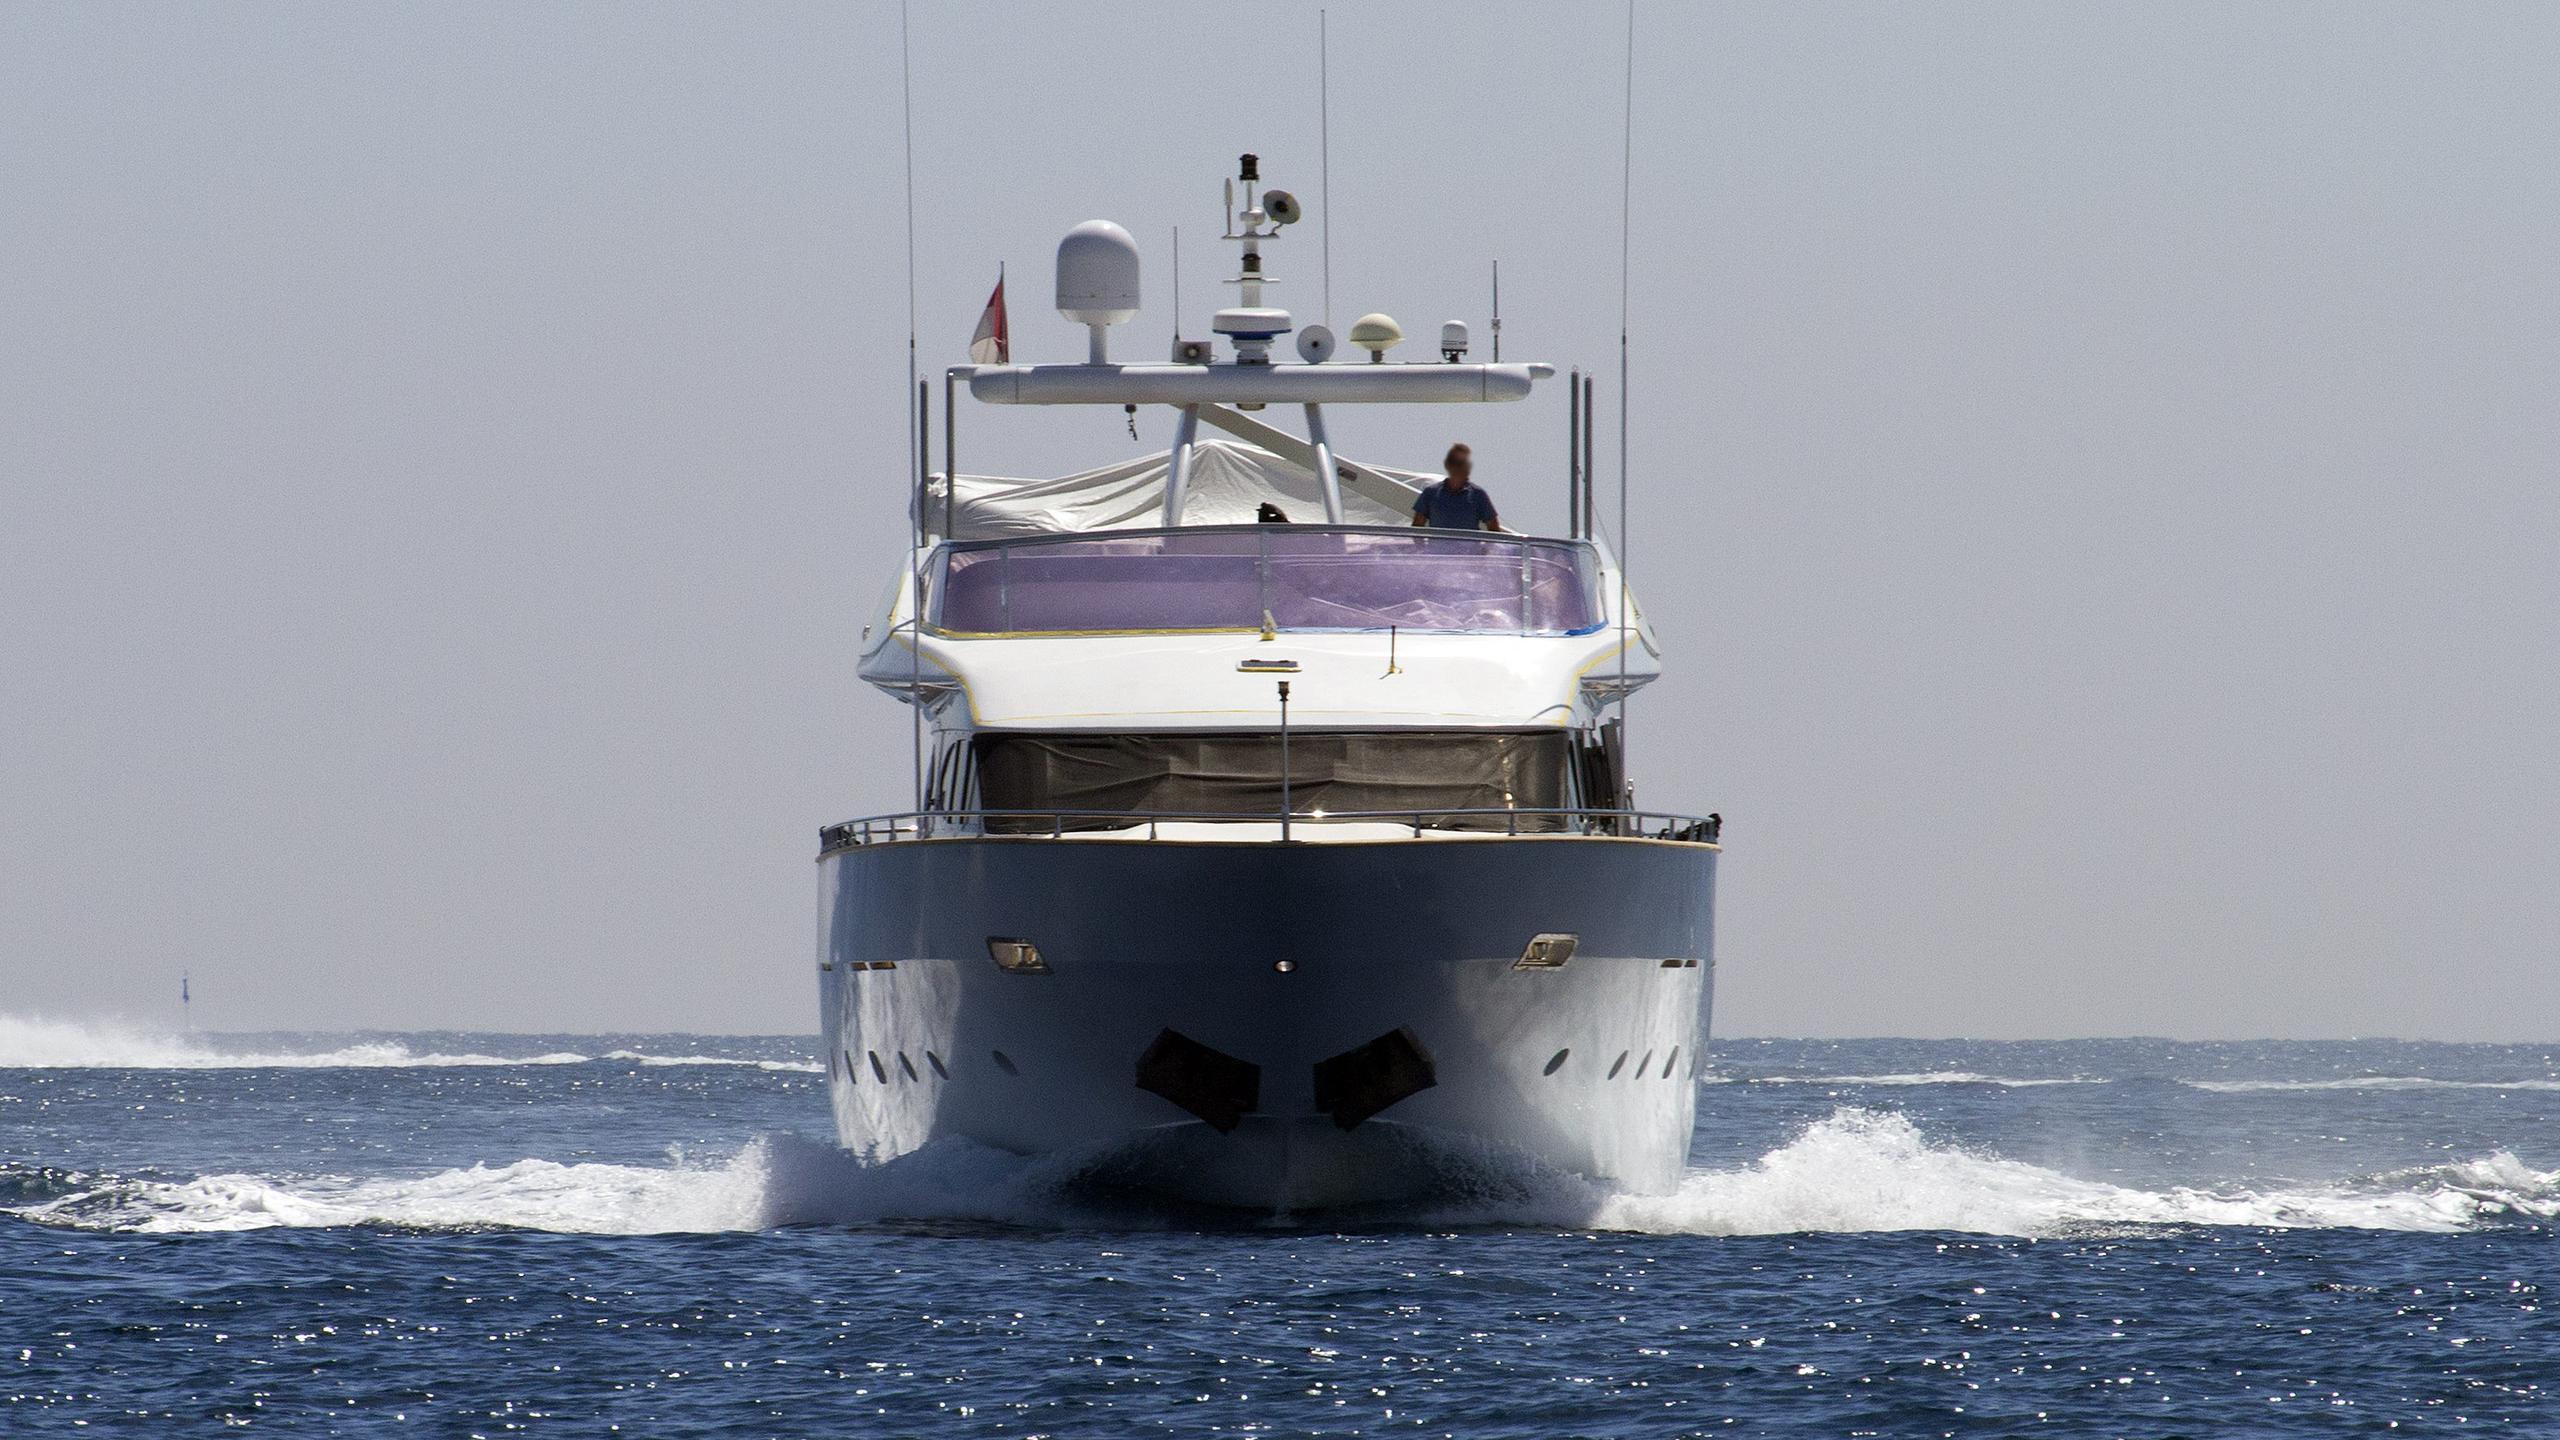 talila-motor-yacht-mondomarine-mondo-29m-2000-28m-running-bow